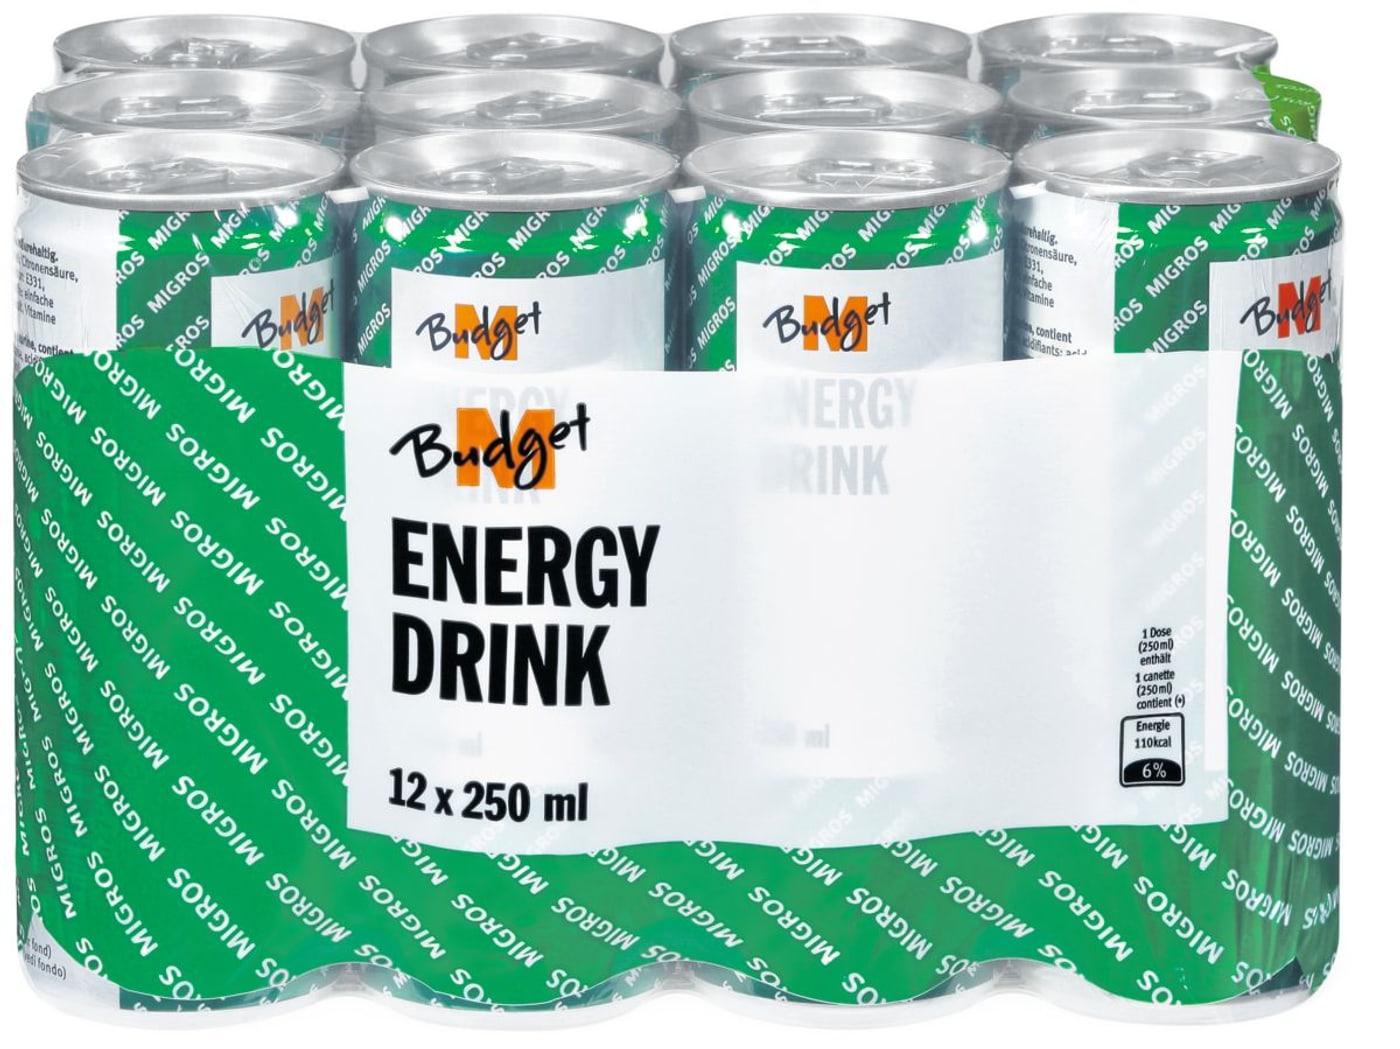 M-Budget Energy Drink | Migros